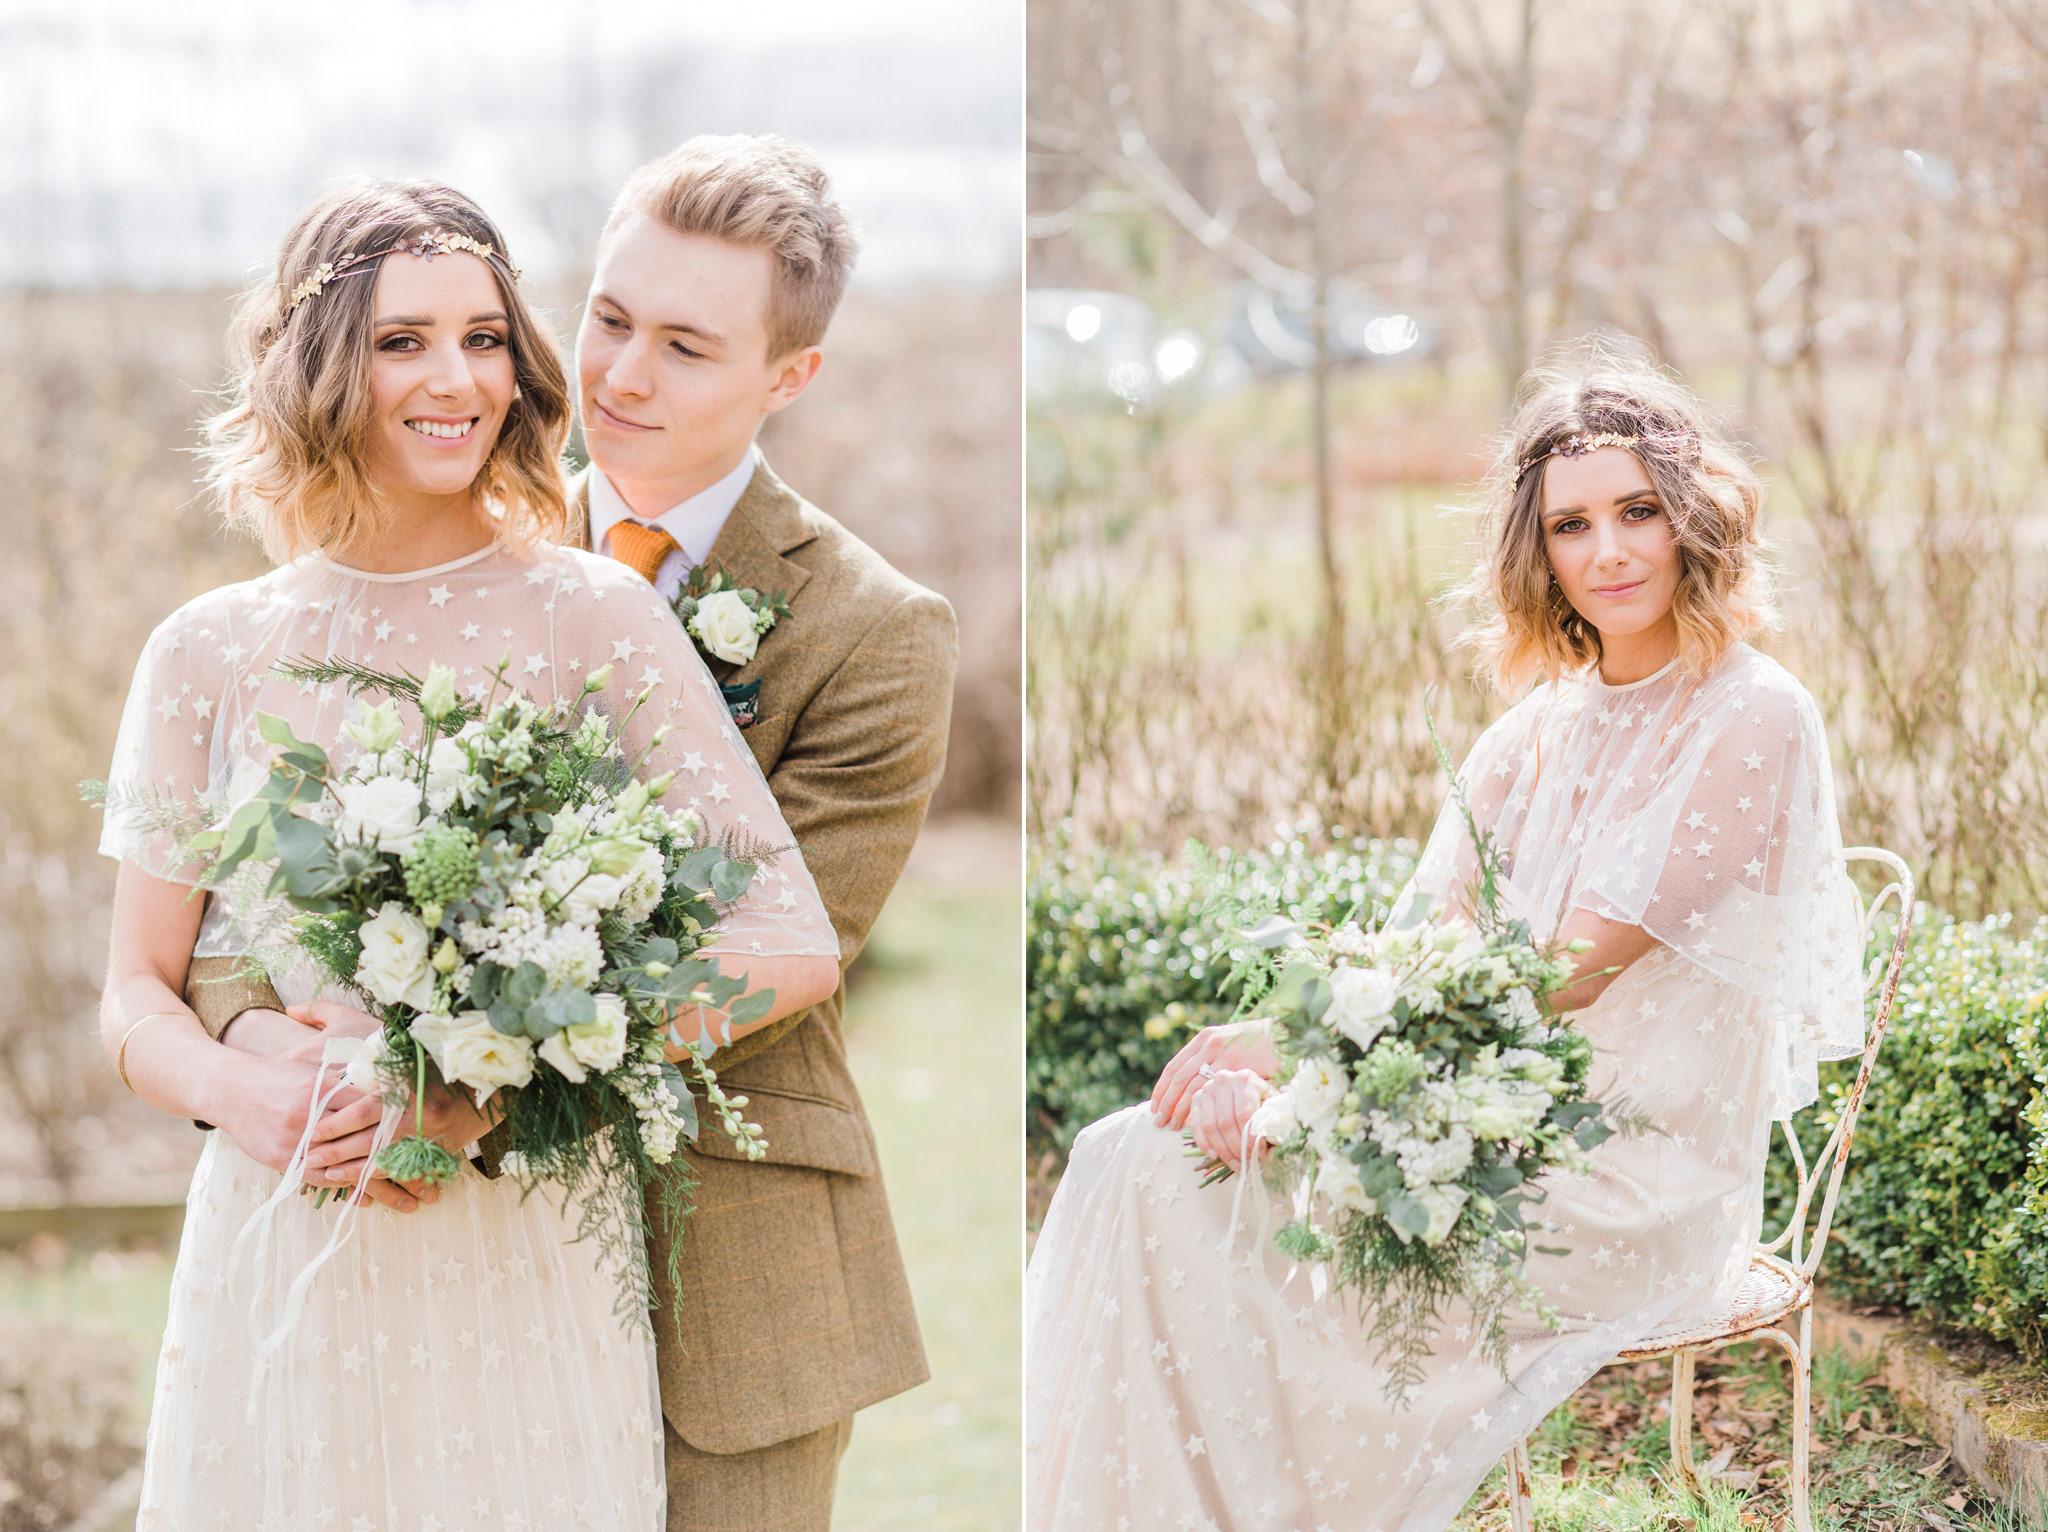 rustic-romantic-outdoor-wedding-photographer-edinburgh-11.jpg